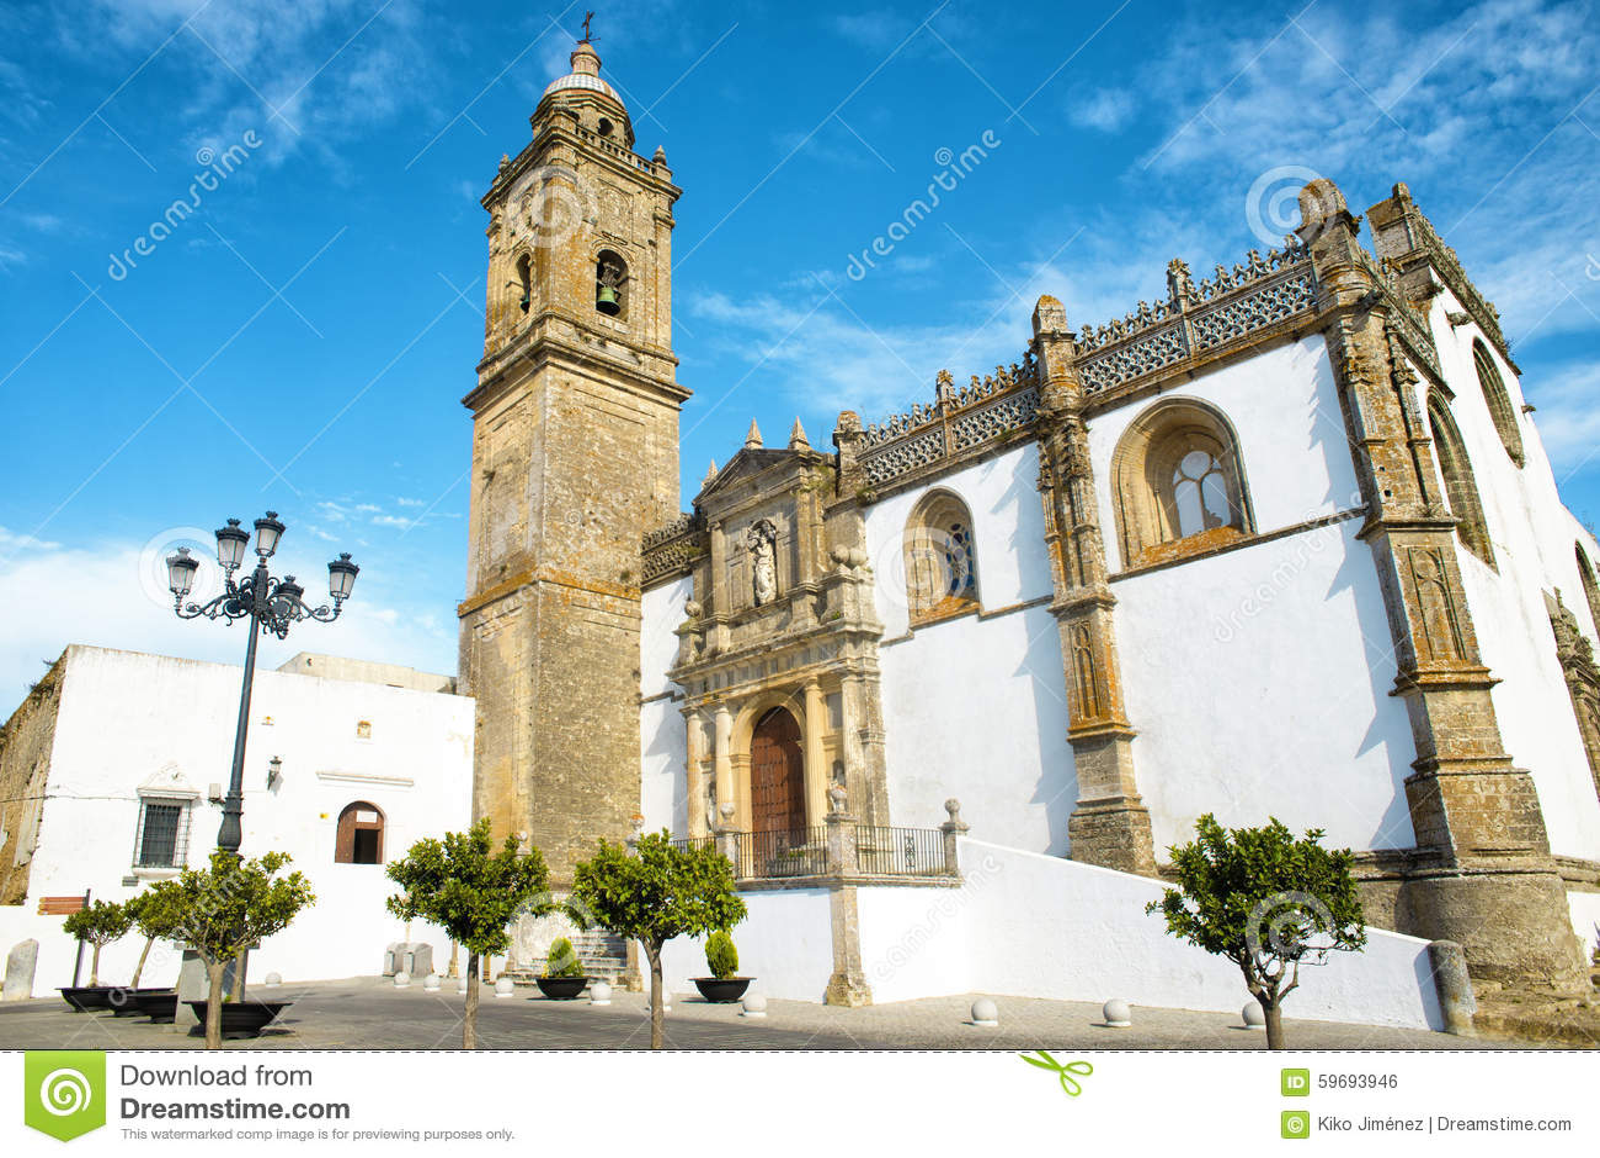 Church in Medina Sidonia, Andalusia, Spain.